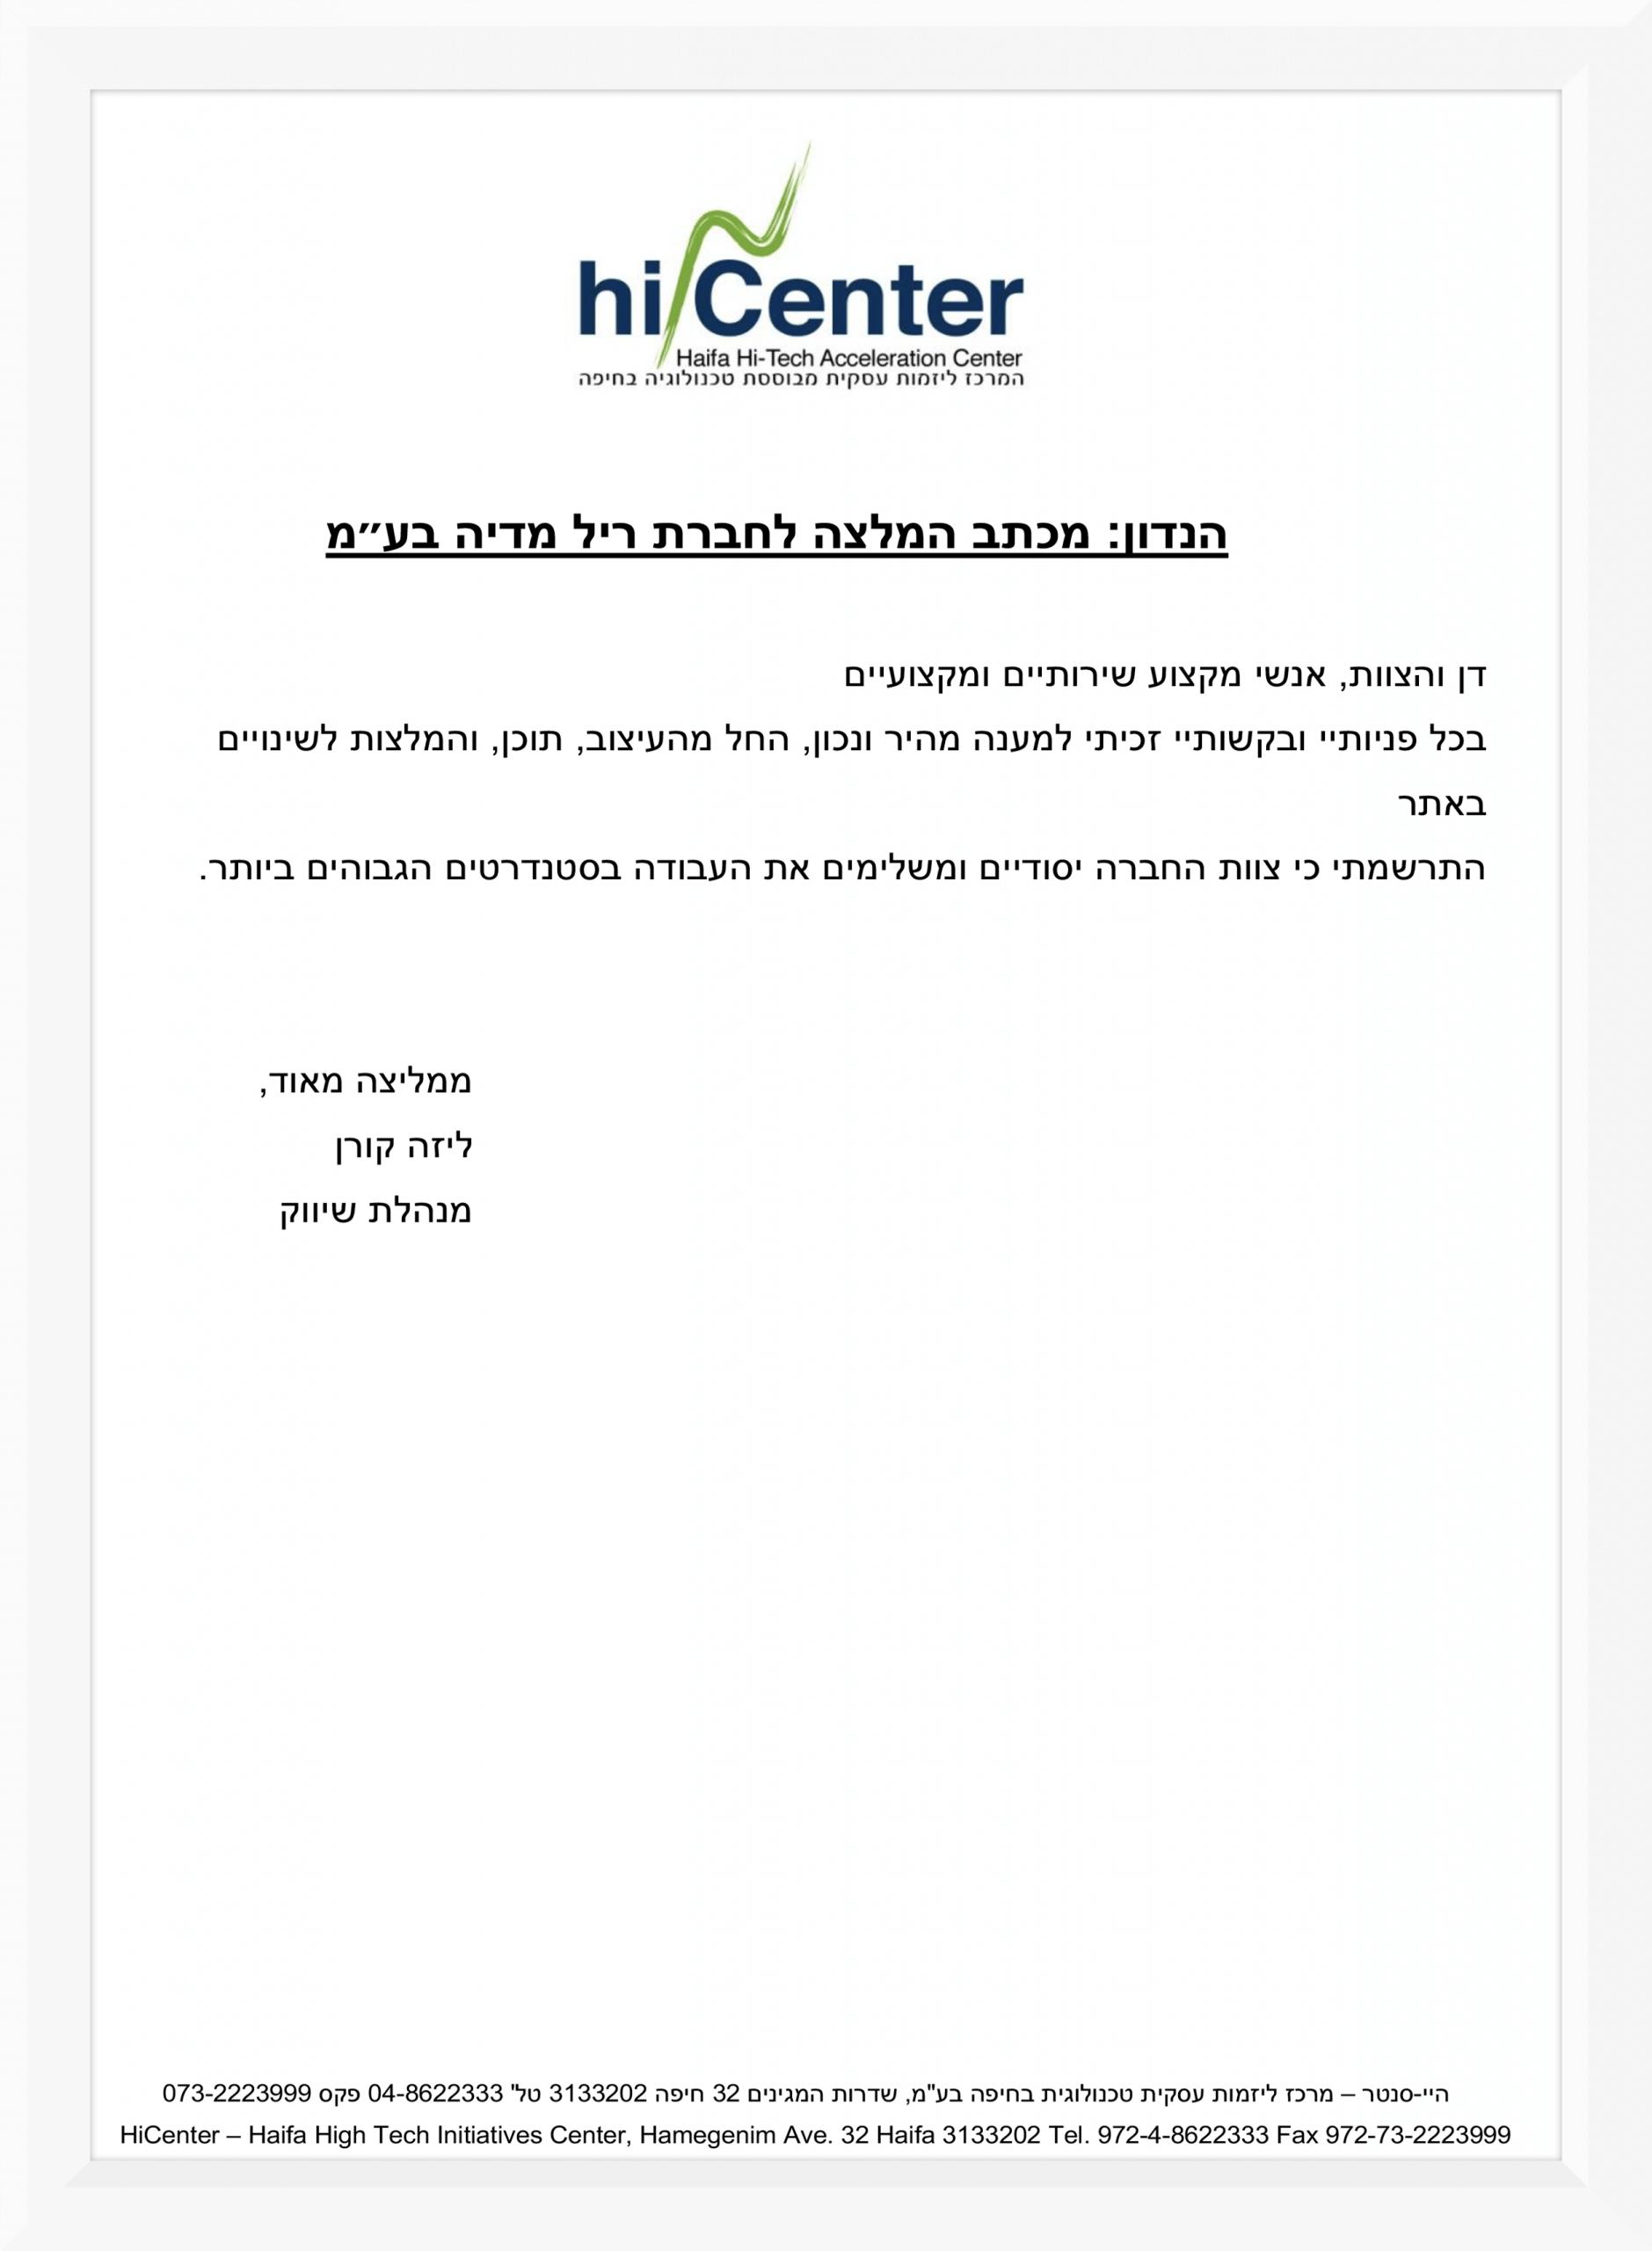 hicenter